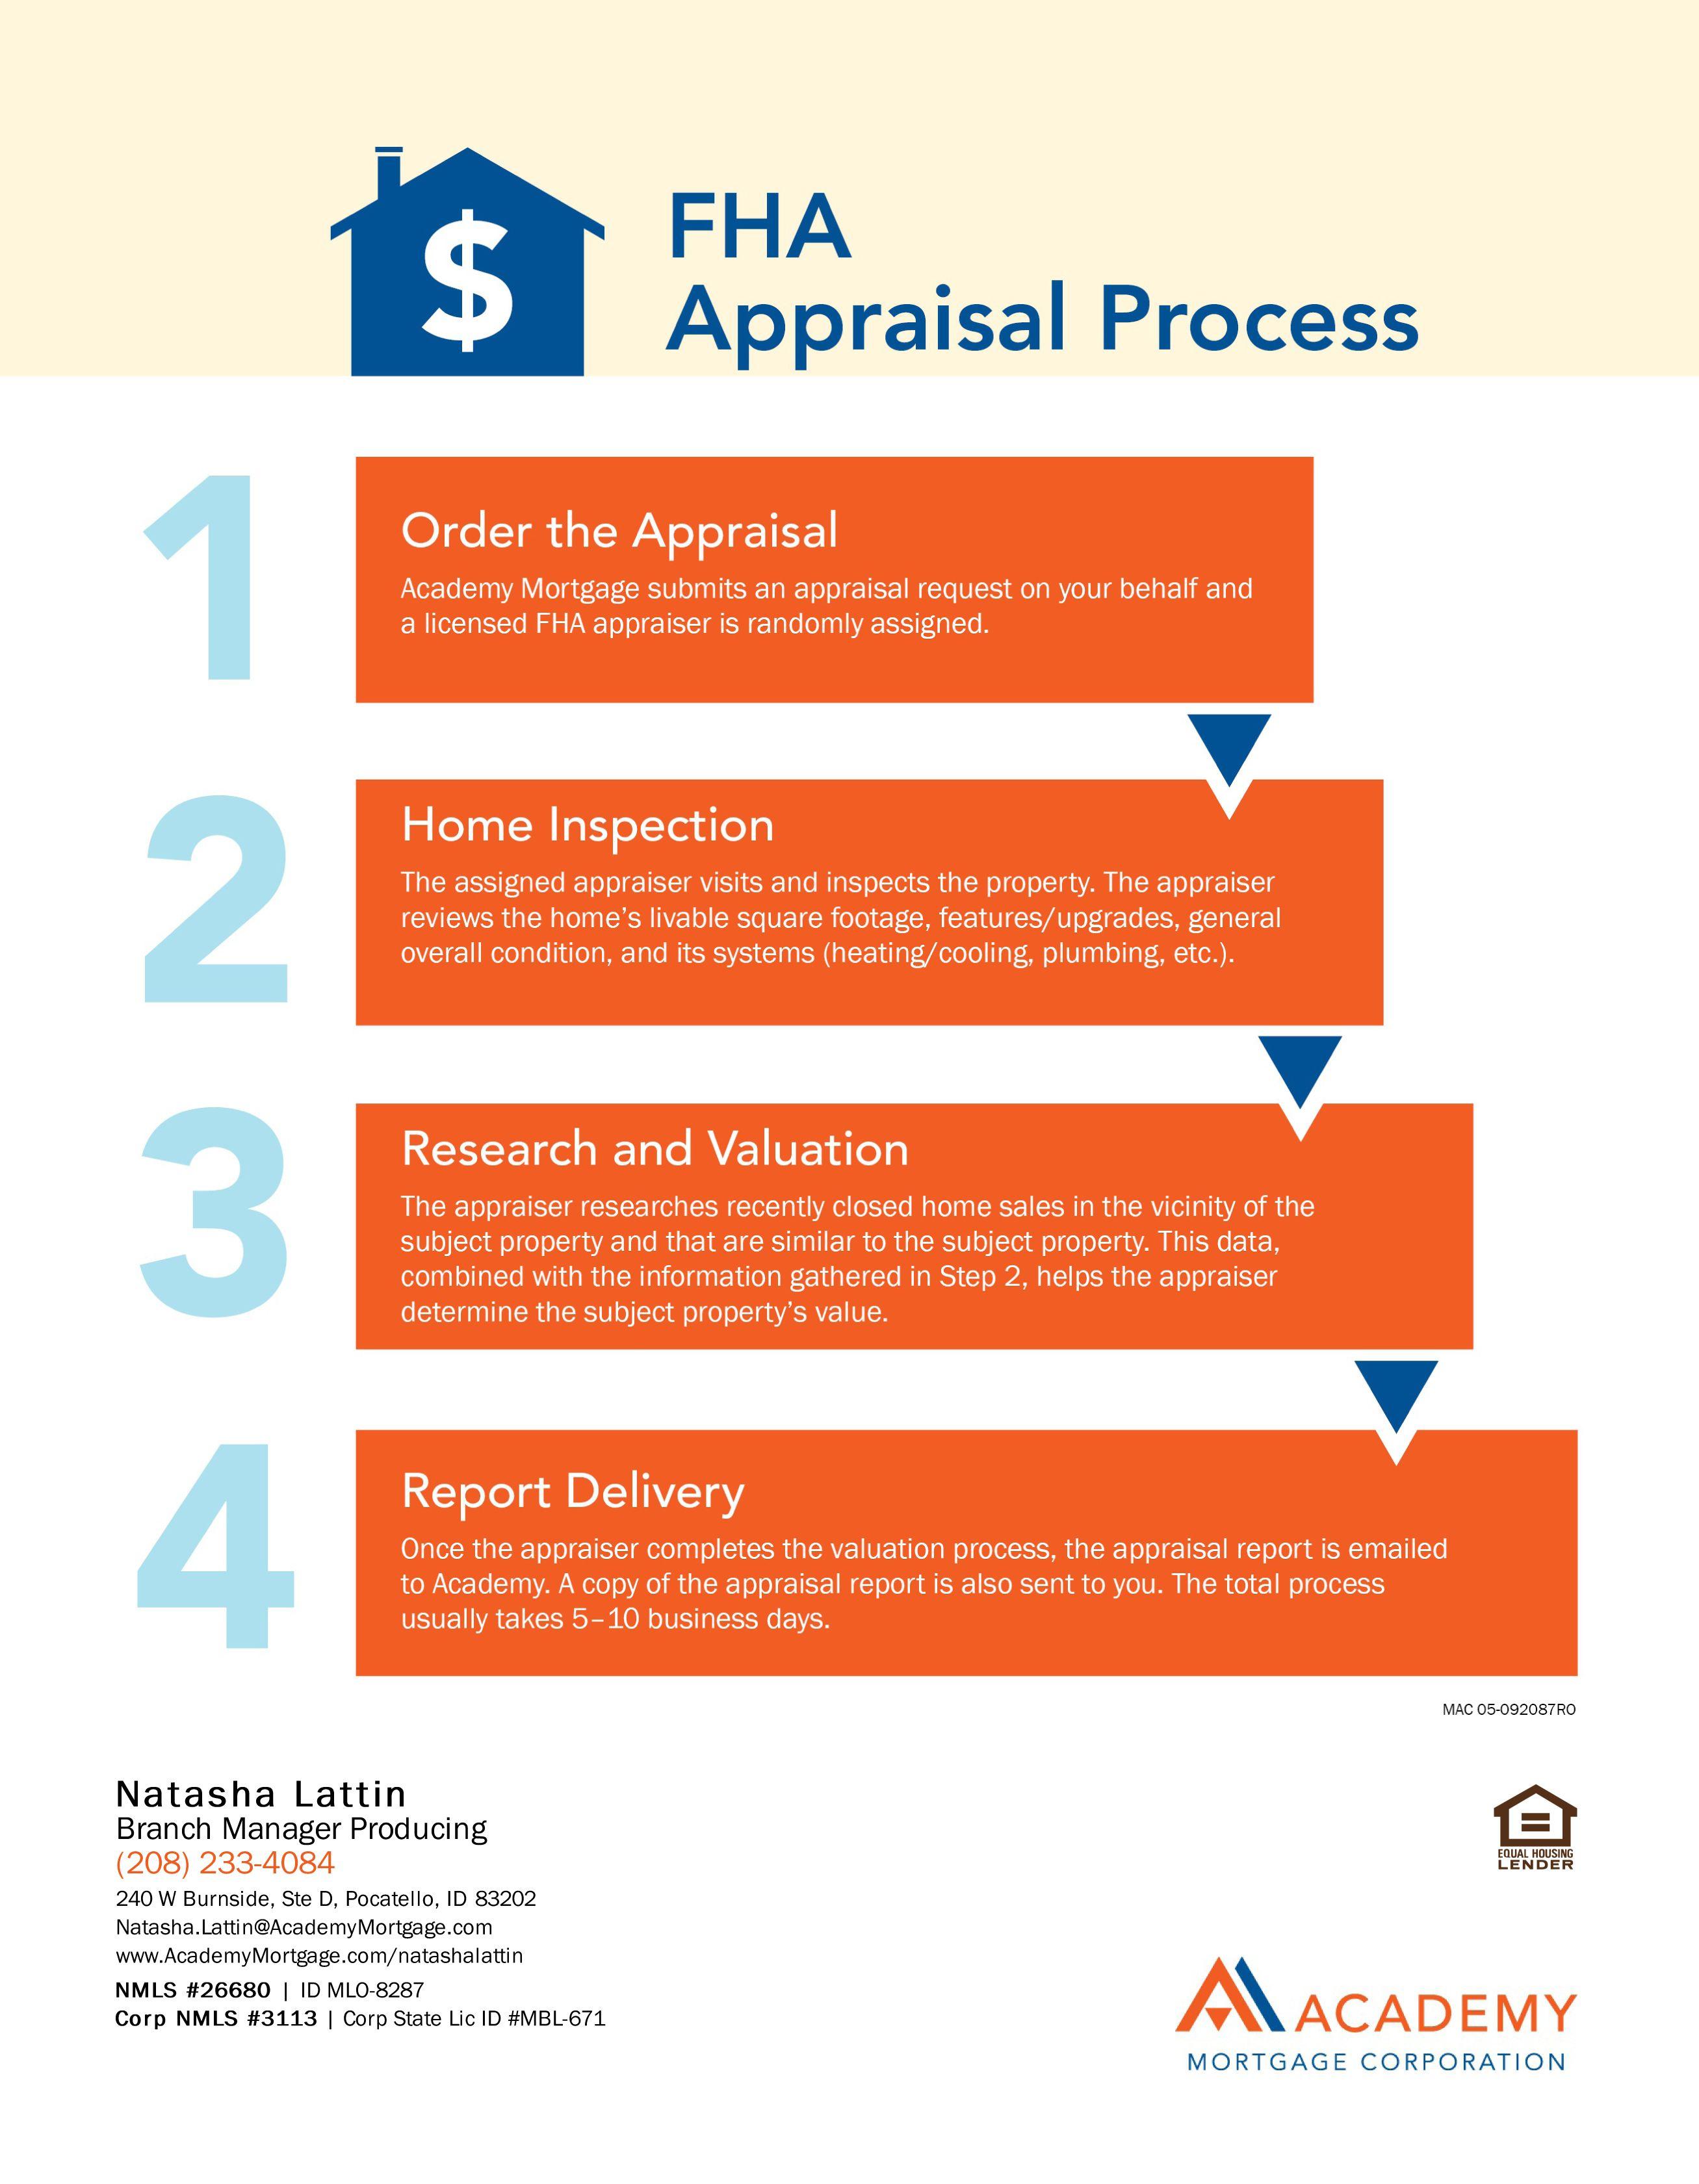 Fha appraisal process marketing images appraisal